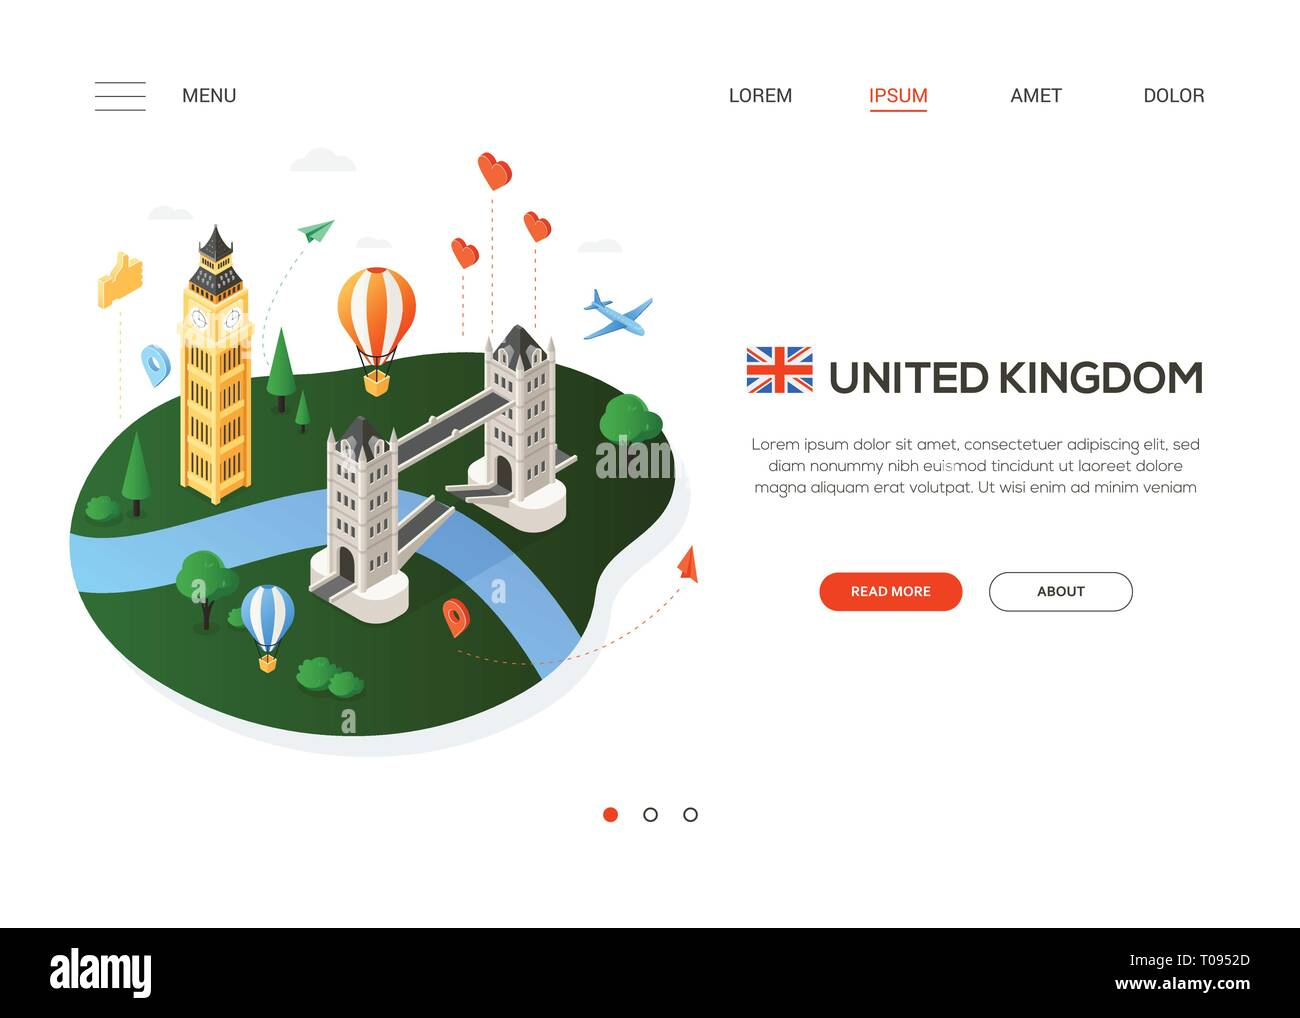 Visit the United Kingdom - modern colorful isometric web banner - Stock Image